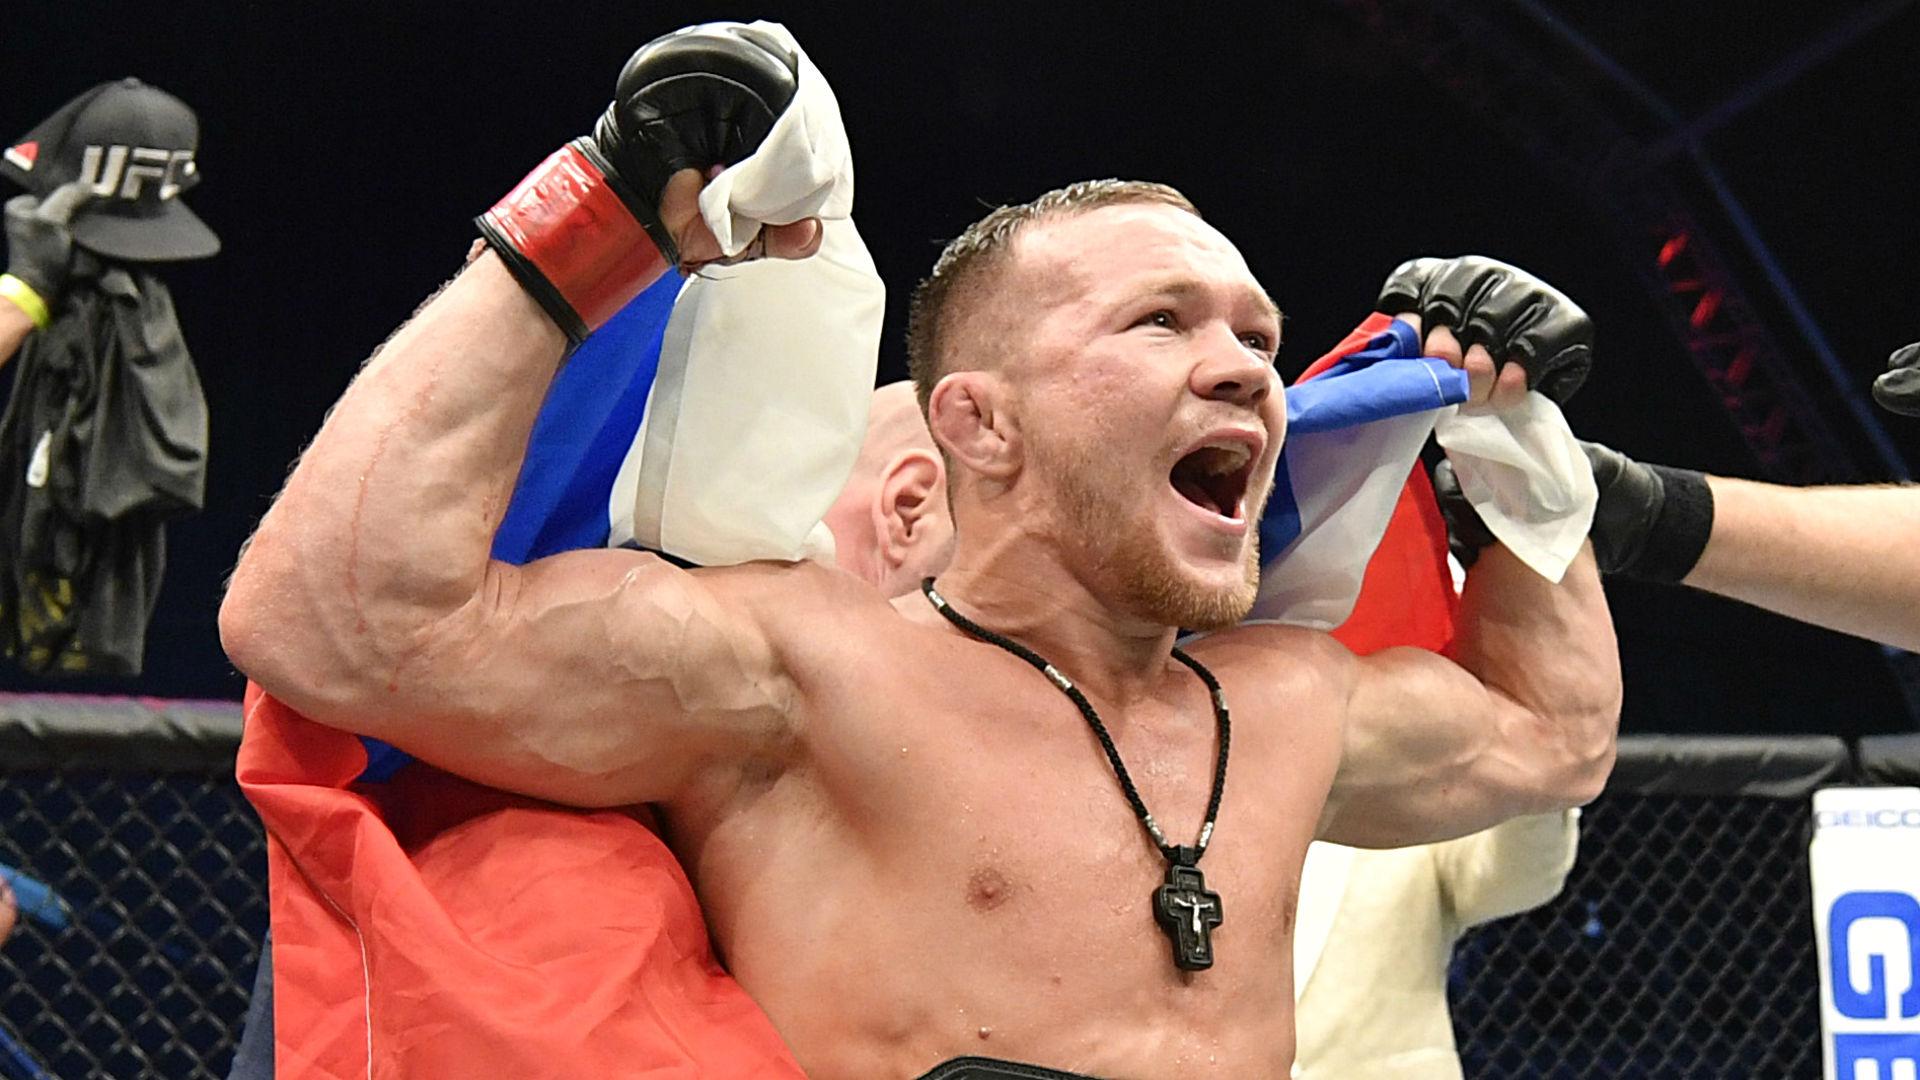 UFC 251: Petr Yan stops Jose Aldo with ground-and-pound barrage, grabs bantamweight belt 1